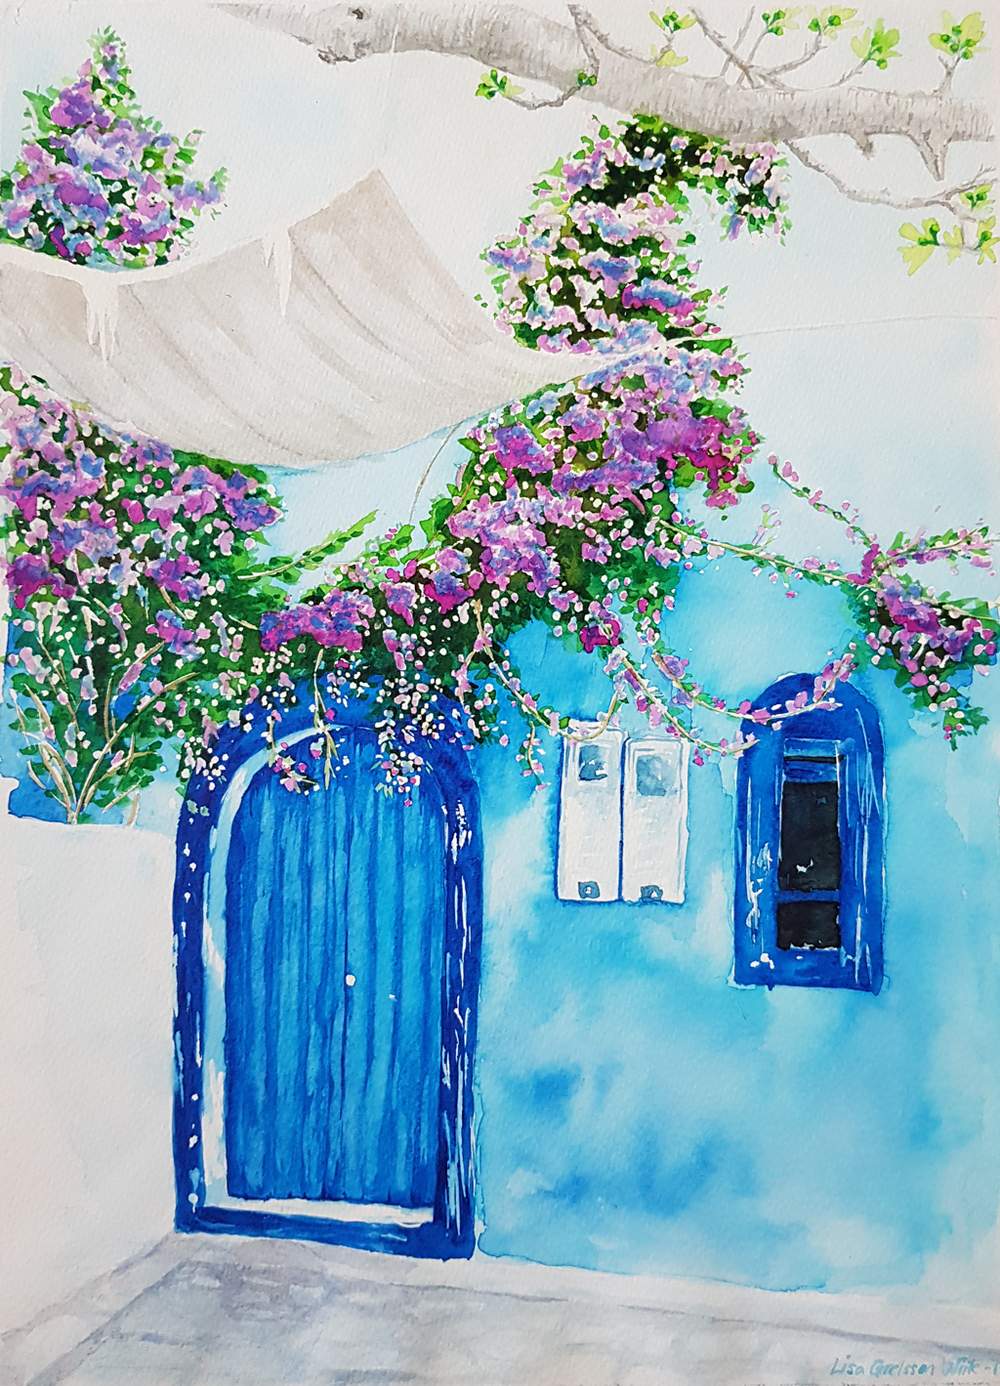 moroccan blues_akvarel_lisa grelsson wiik.png